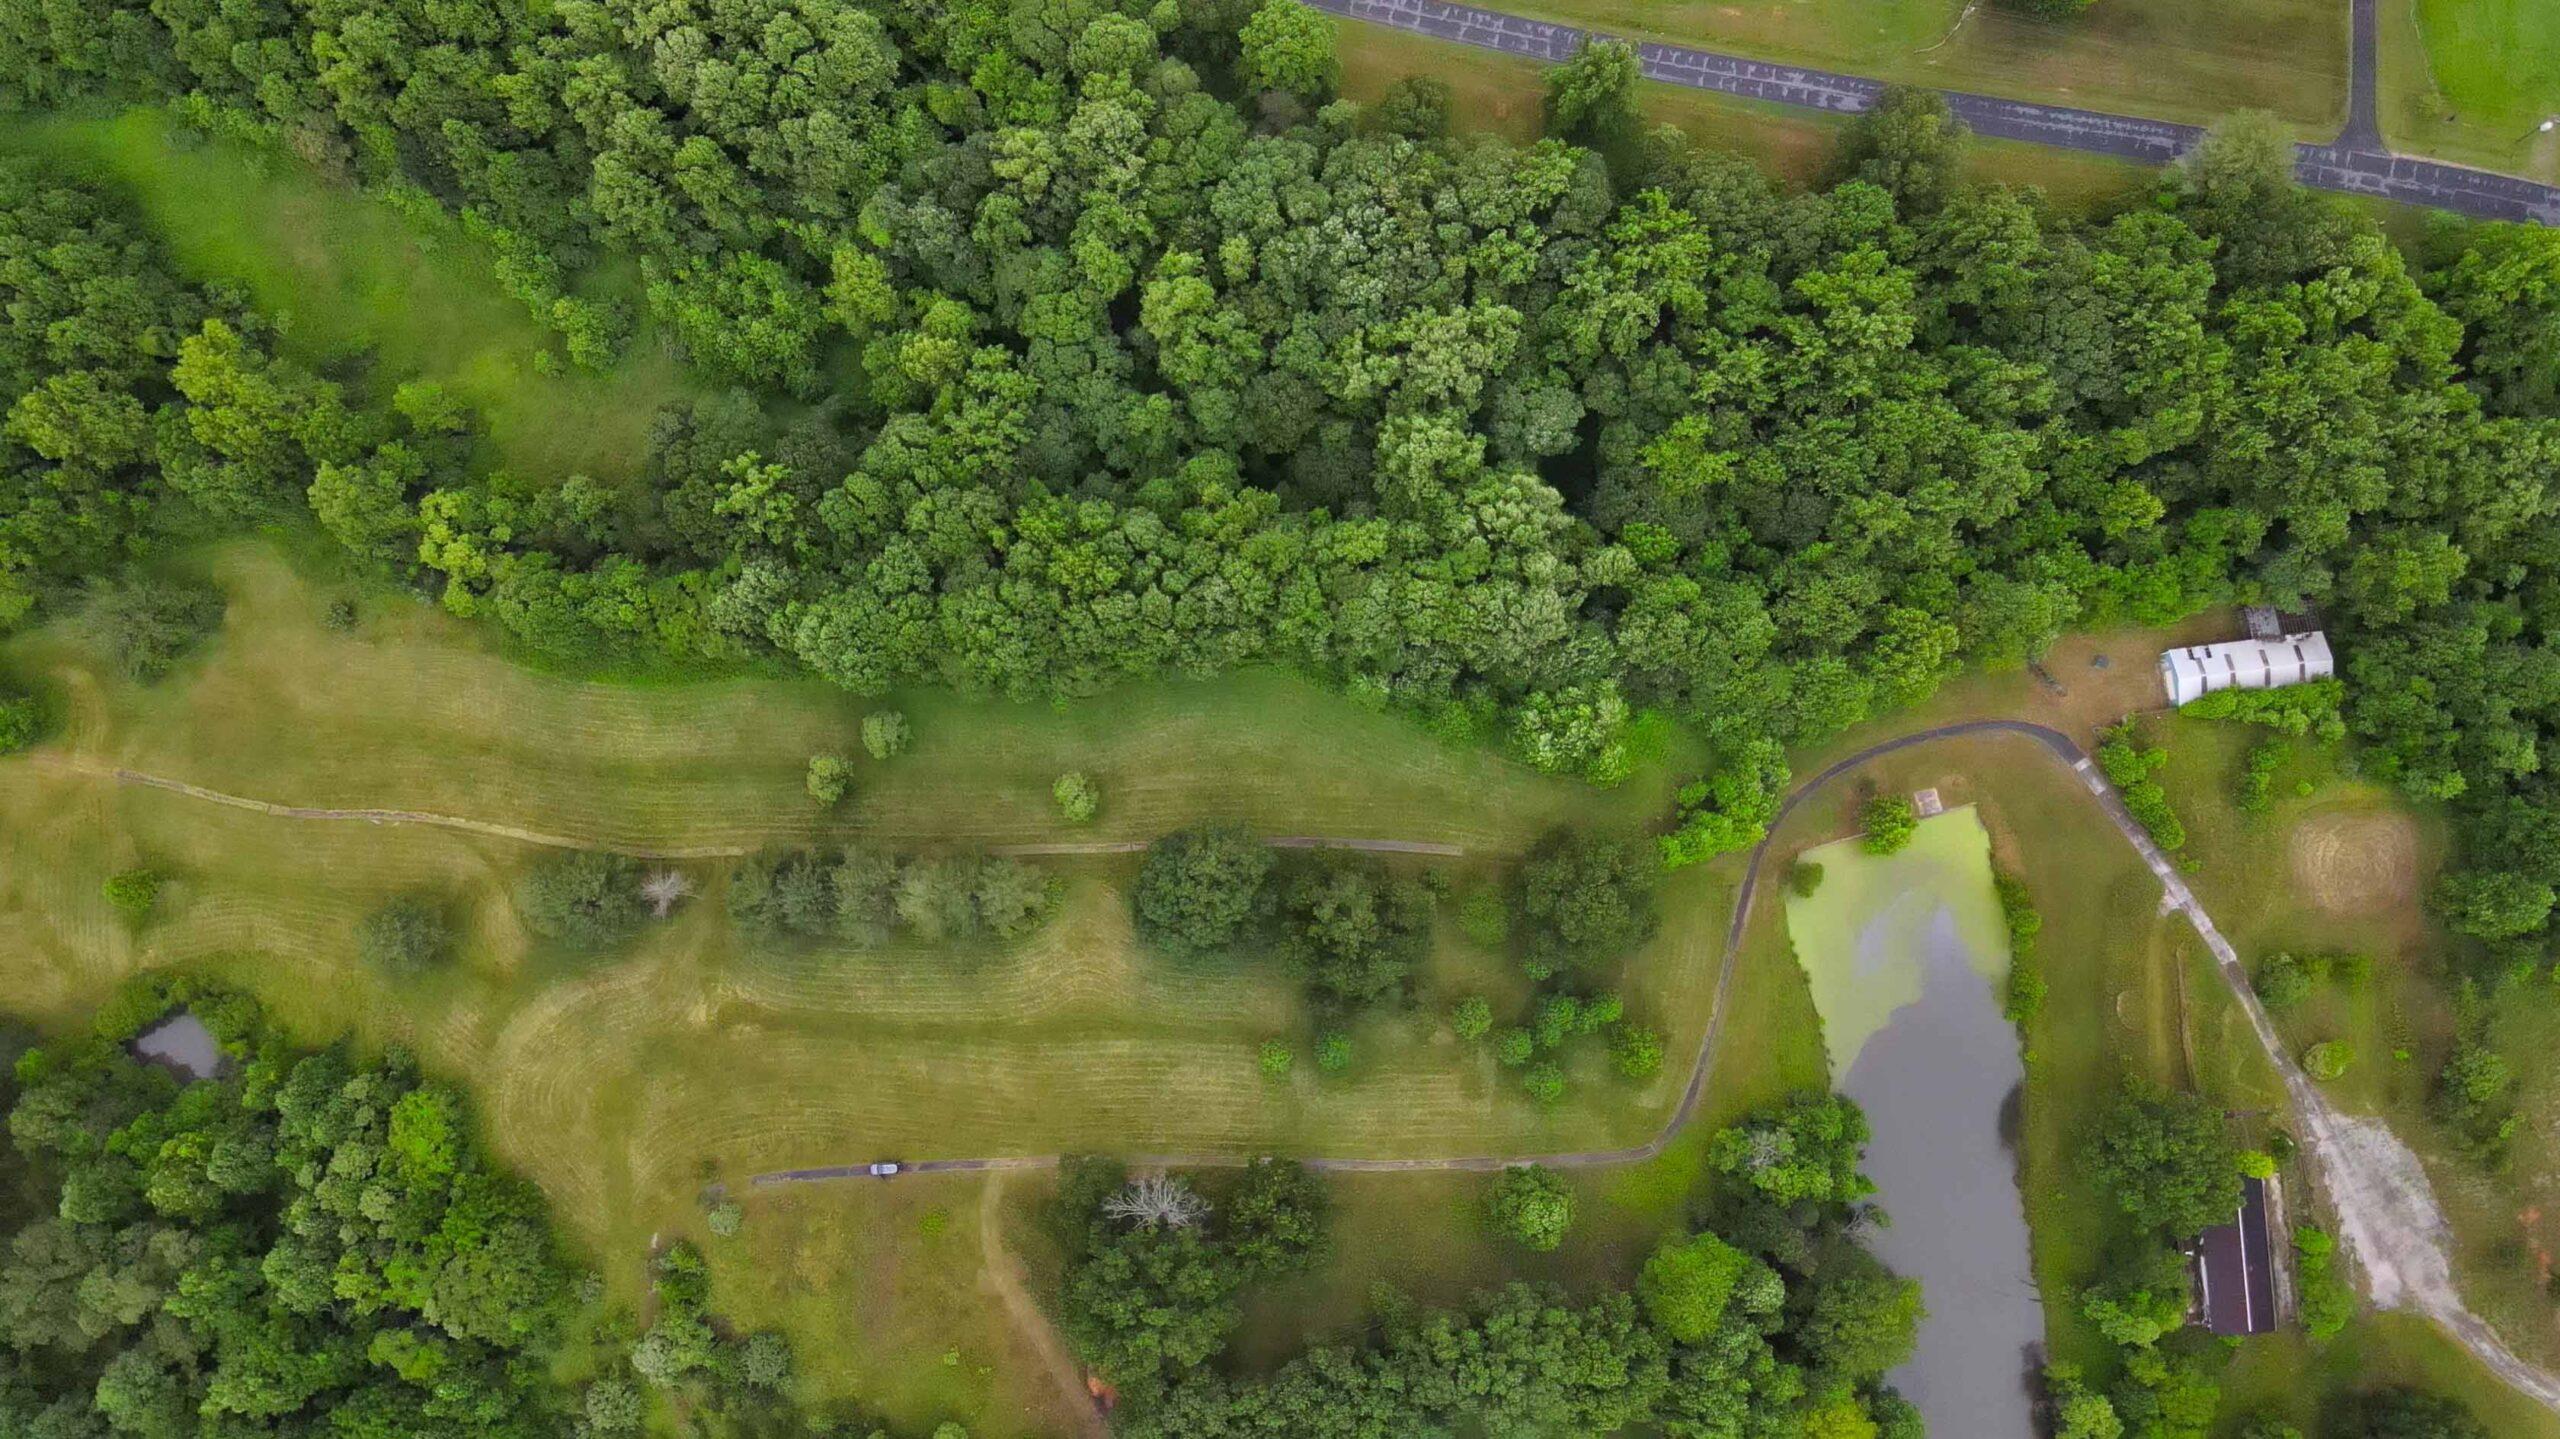 Land Near Smith Mountain Lake, Sycamore Ridge, Lot 11-13